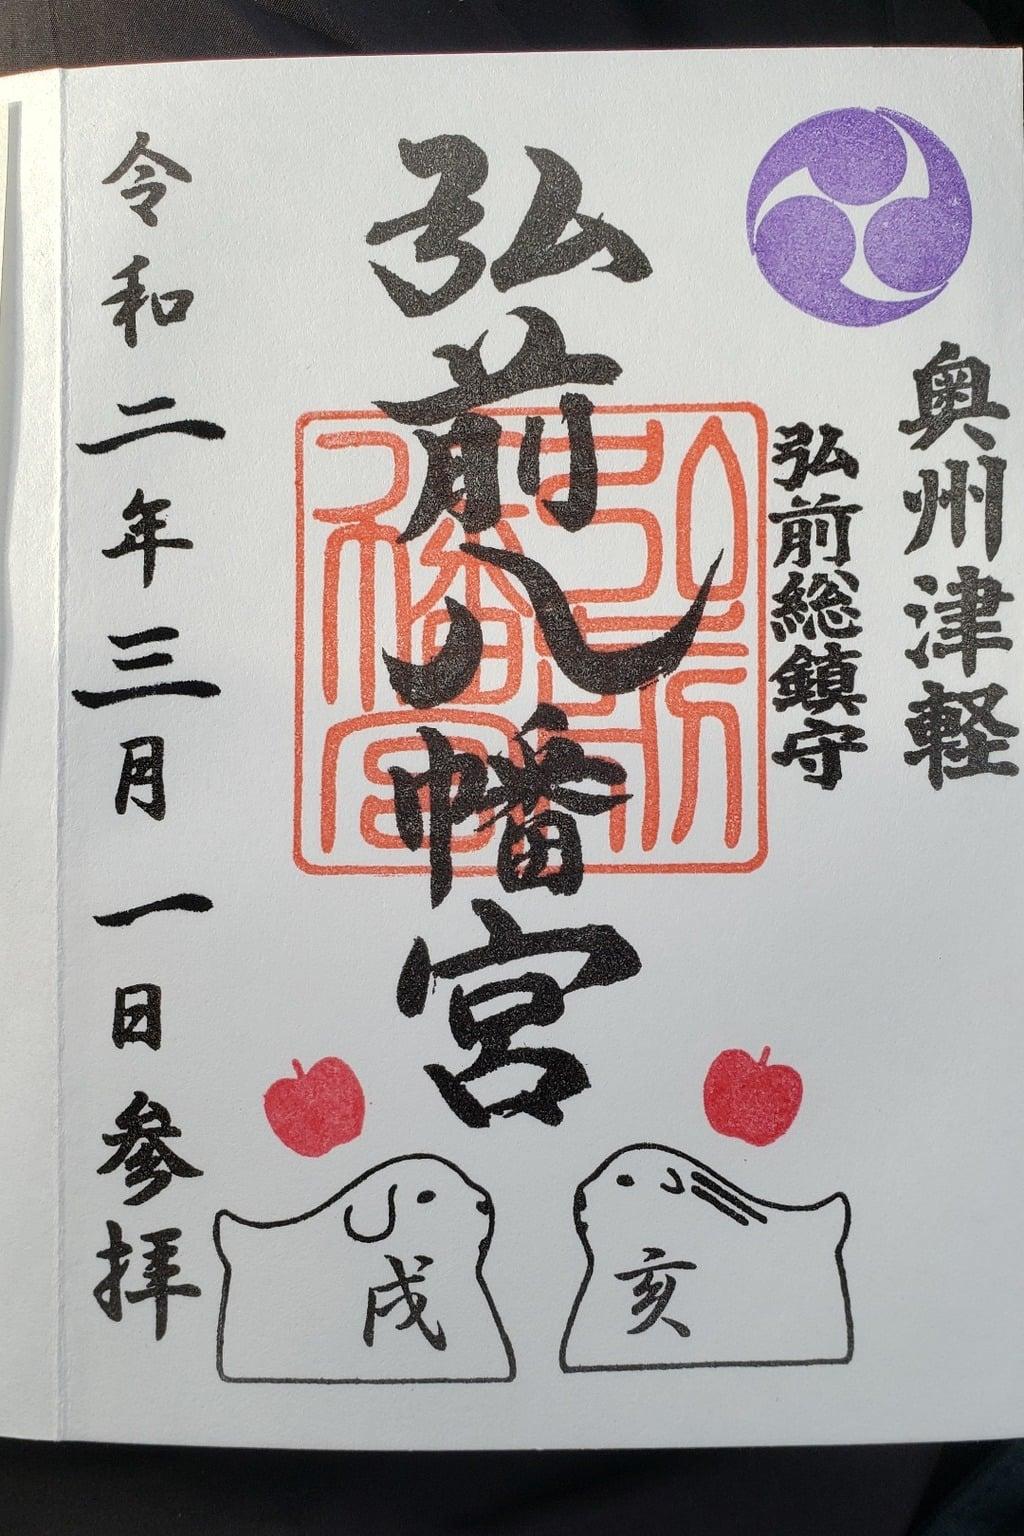 弘前八幡宮の御朱印